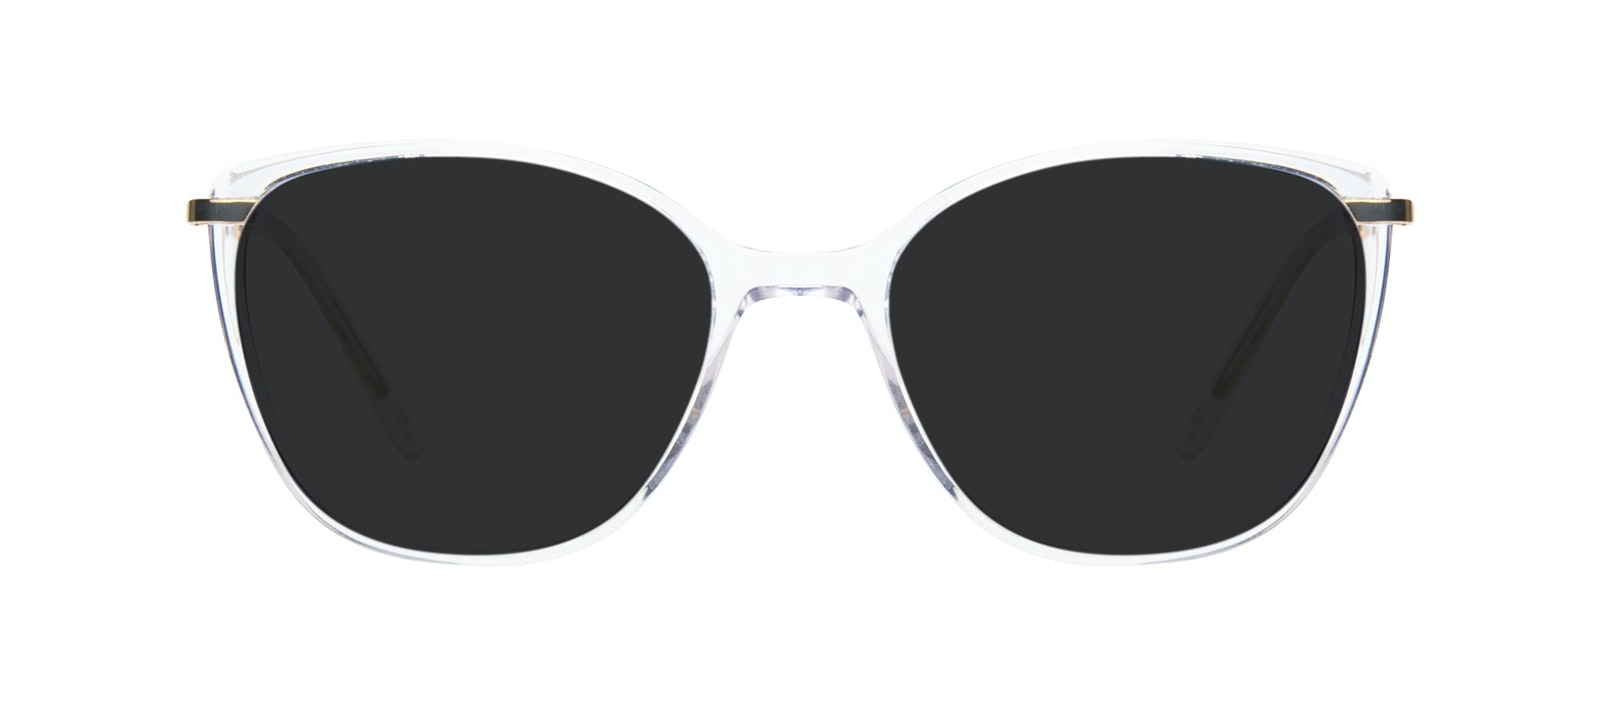 Affordable Fashion Glasses Rectangle Square Sunglasses Women Illusion Gold Diamond Front